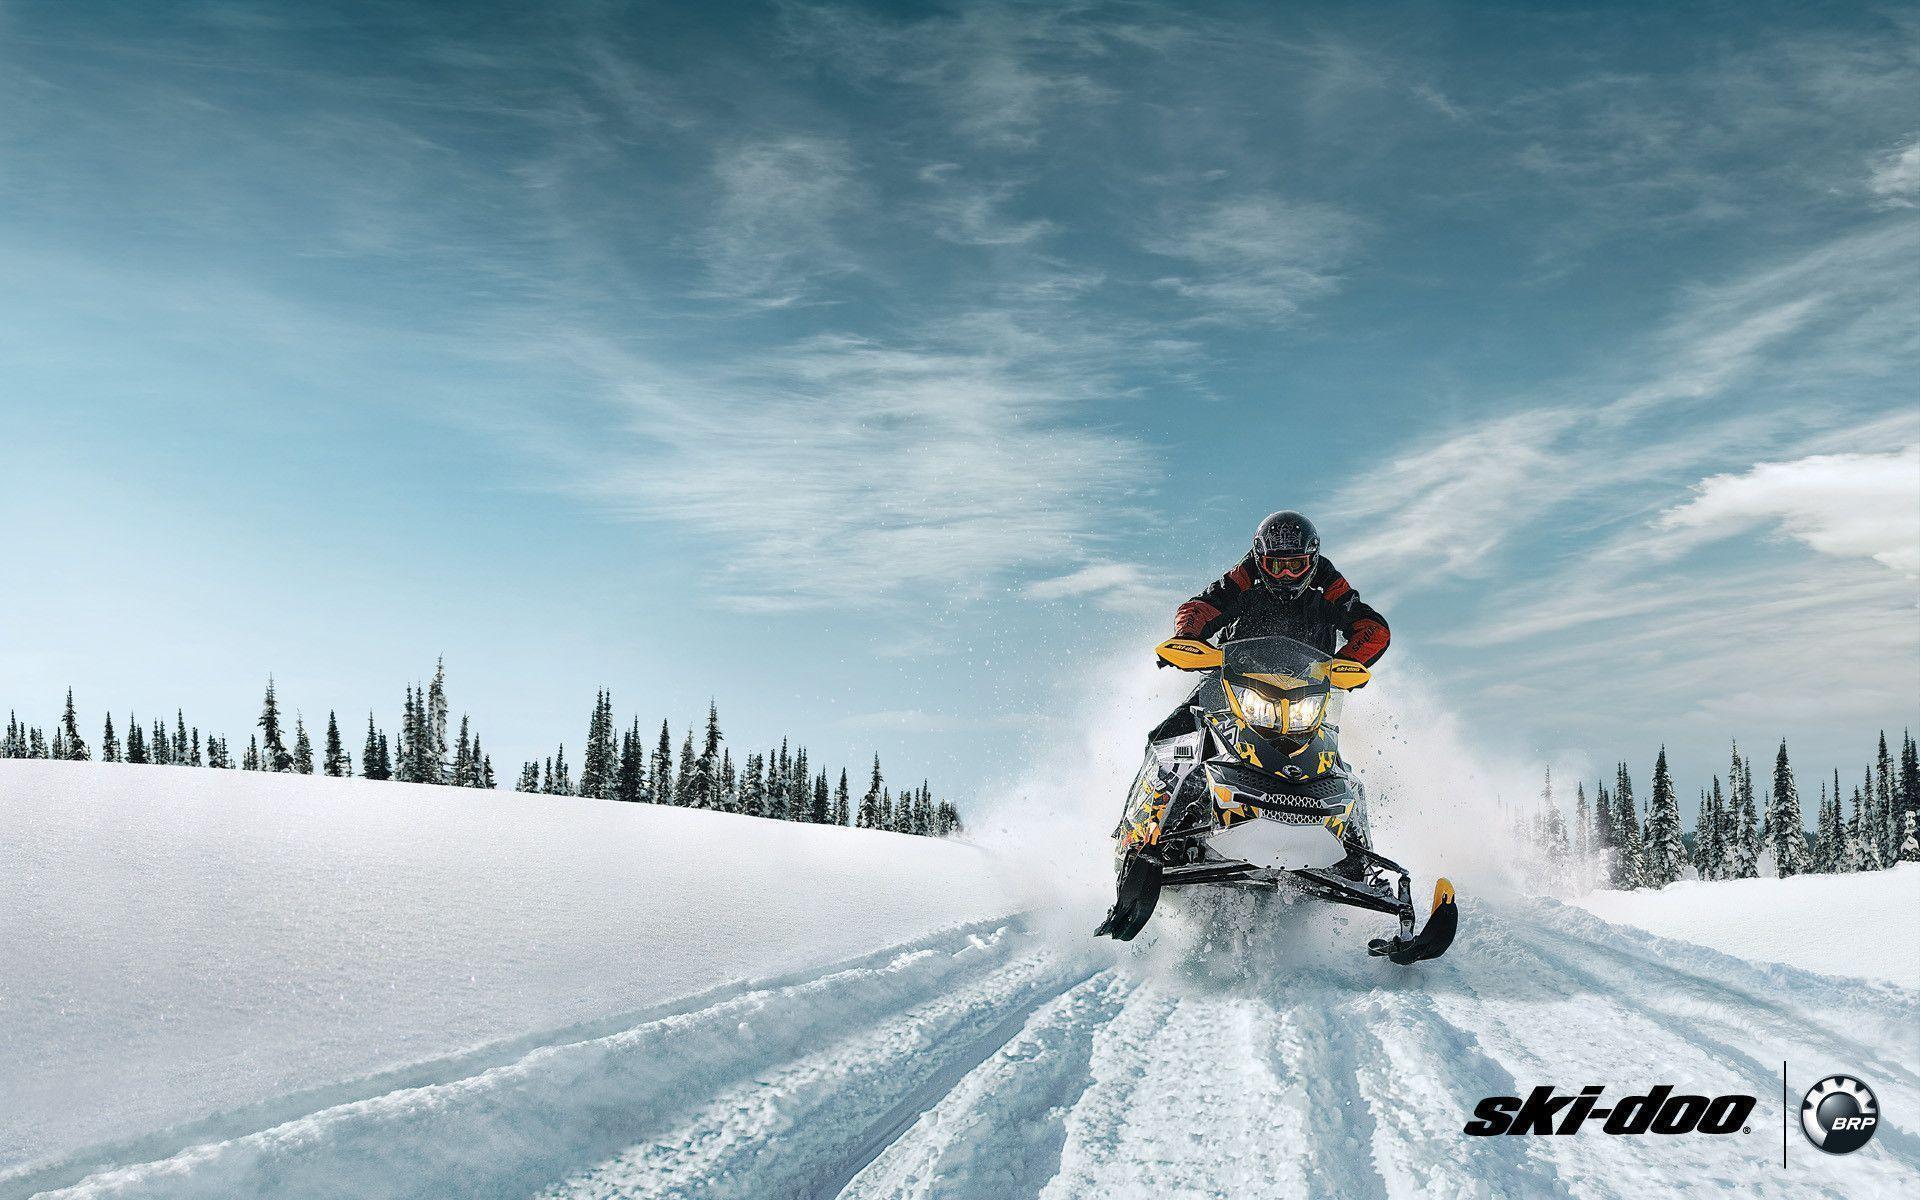 1920x1080 hd wallpapers snowmobile - photo #5